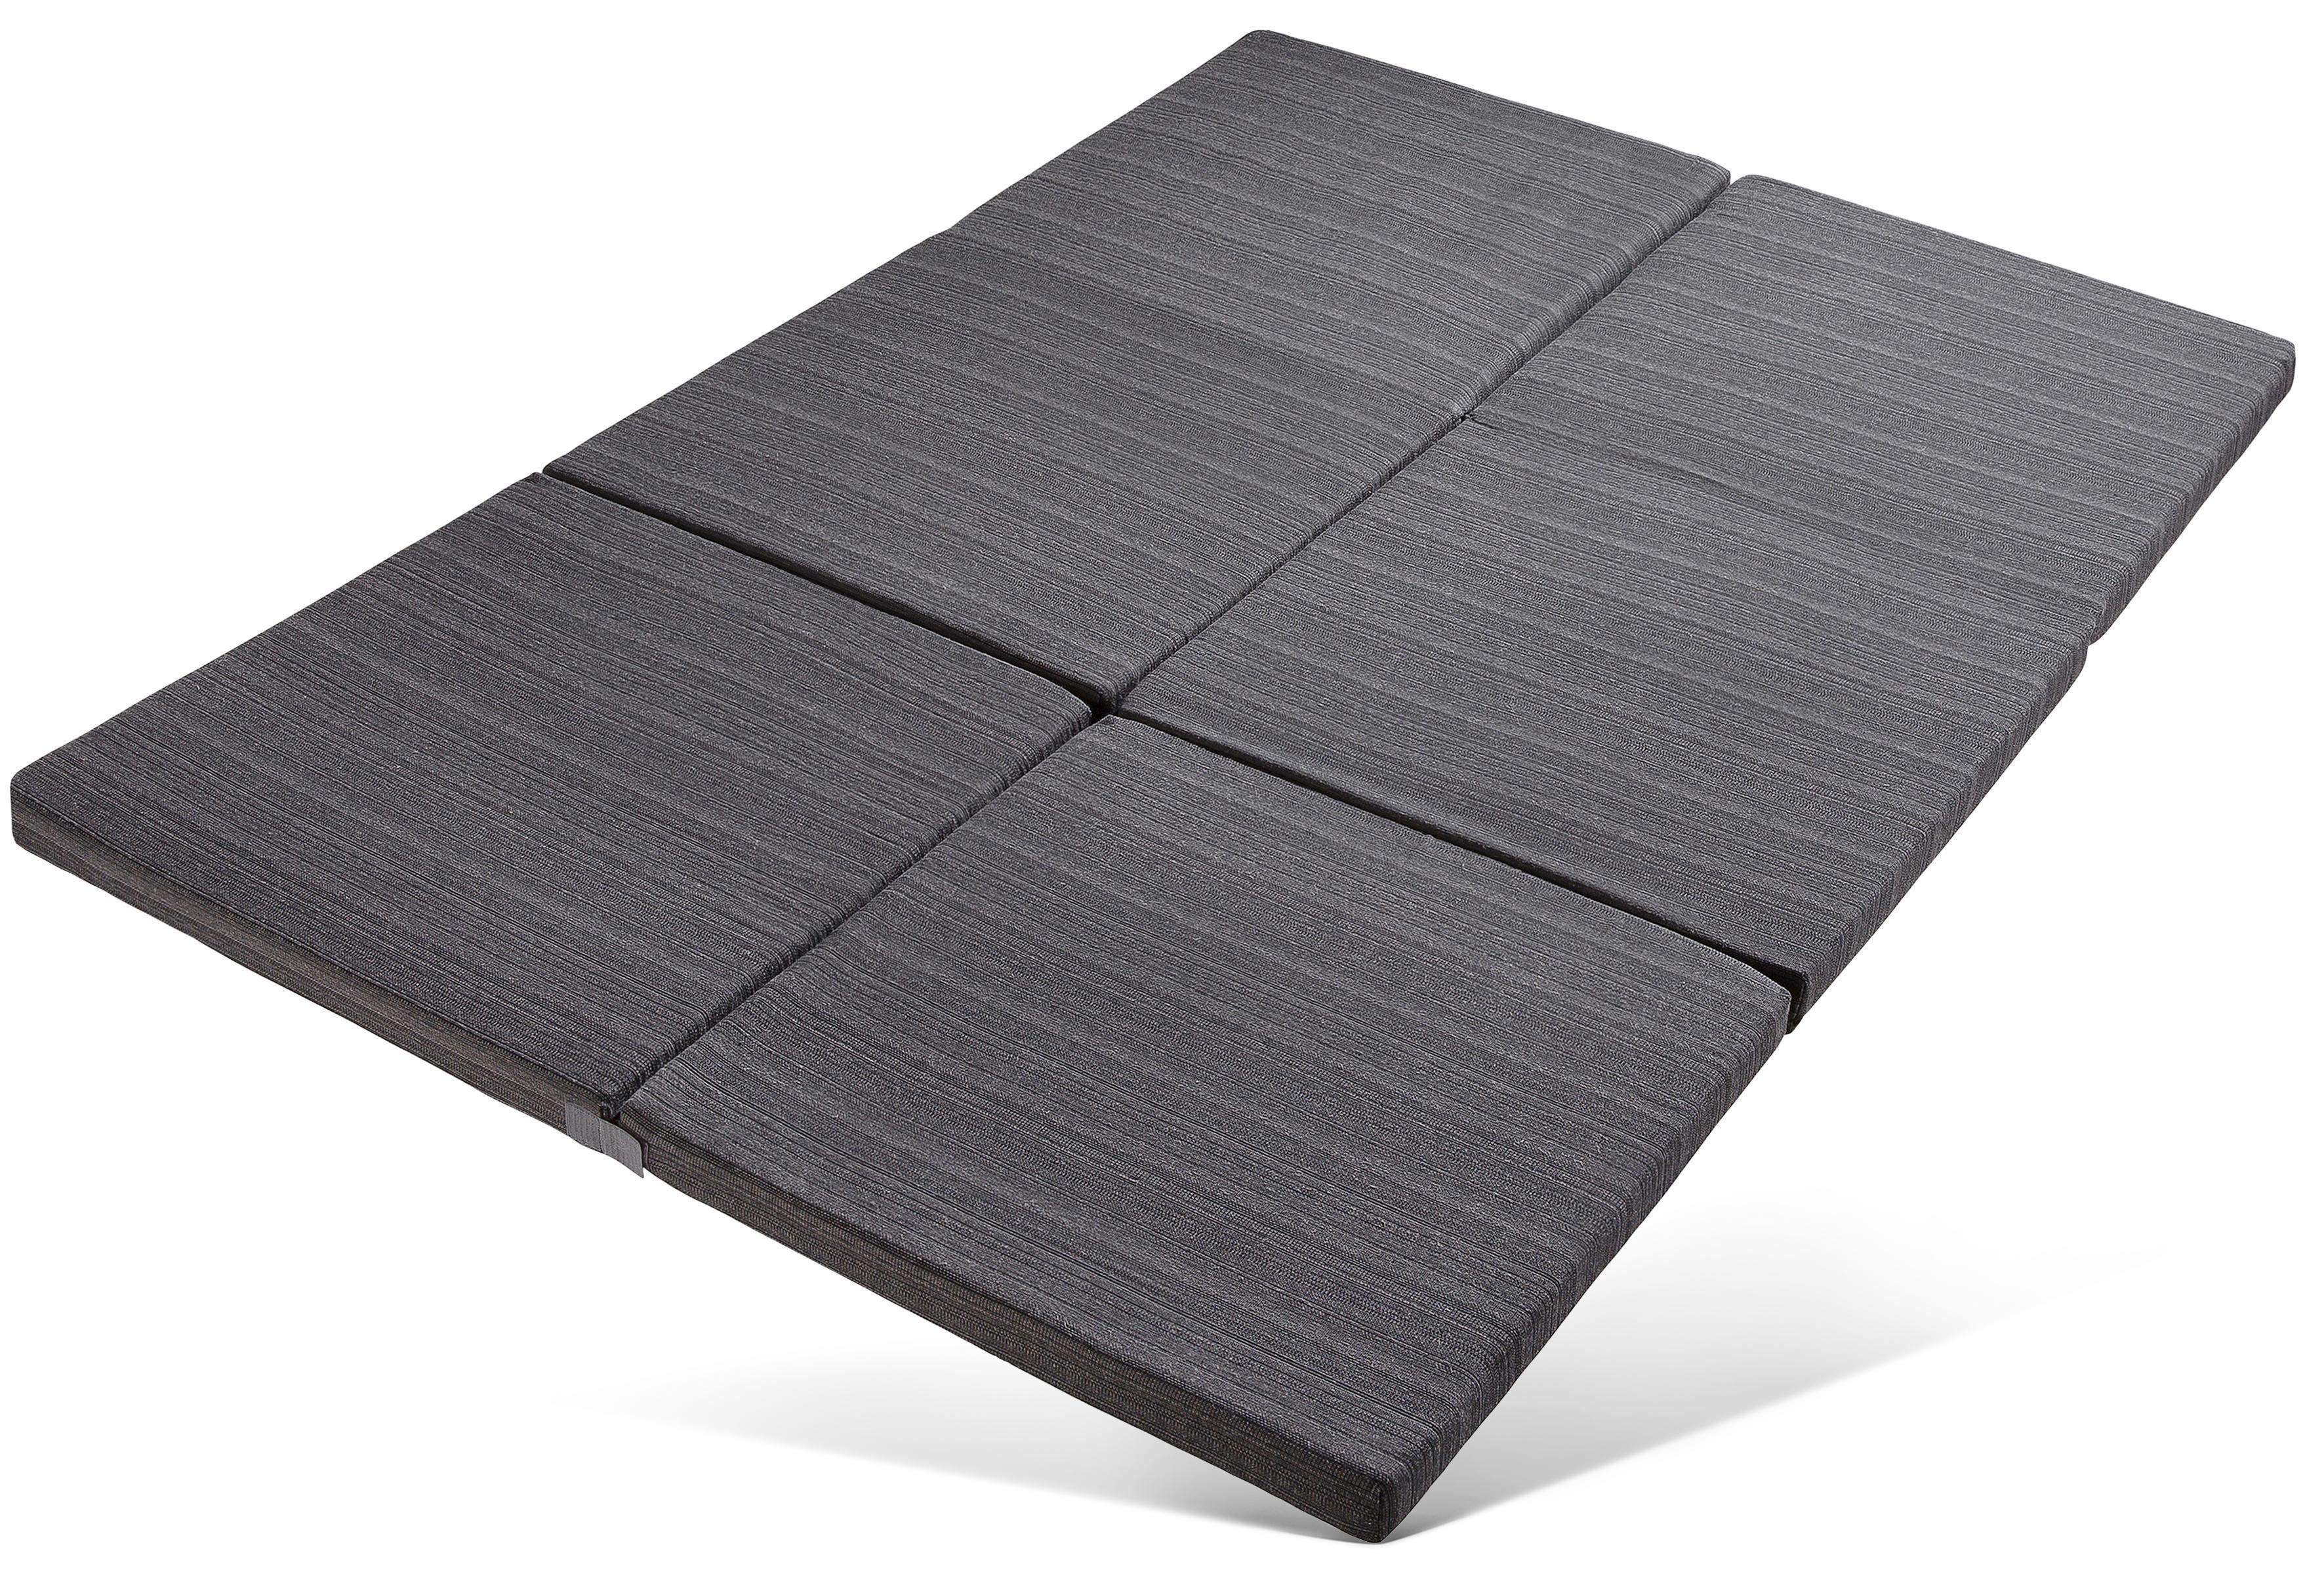 Klappmatratze, »Elli«, RIBECO, 6 cm hoch, Raumgewicht: 25, mit Möbelstoff-Bezug